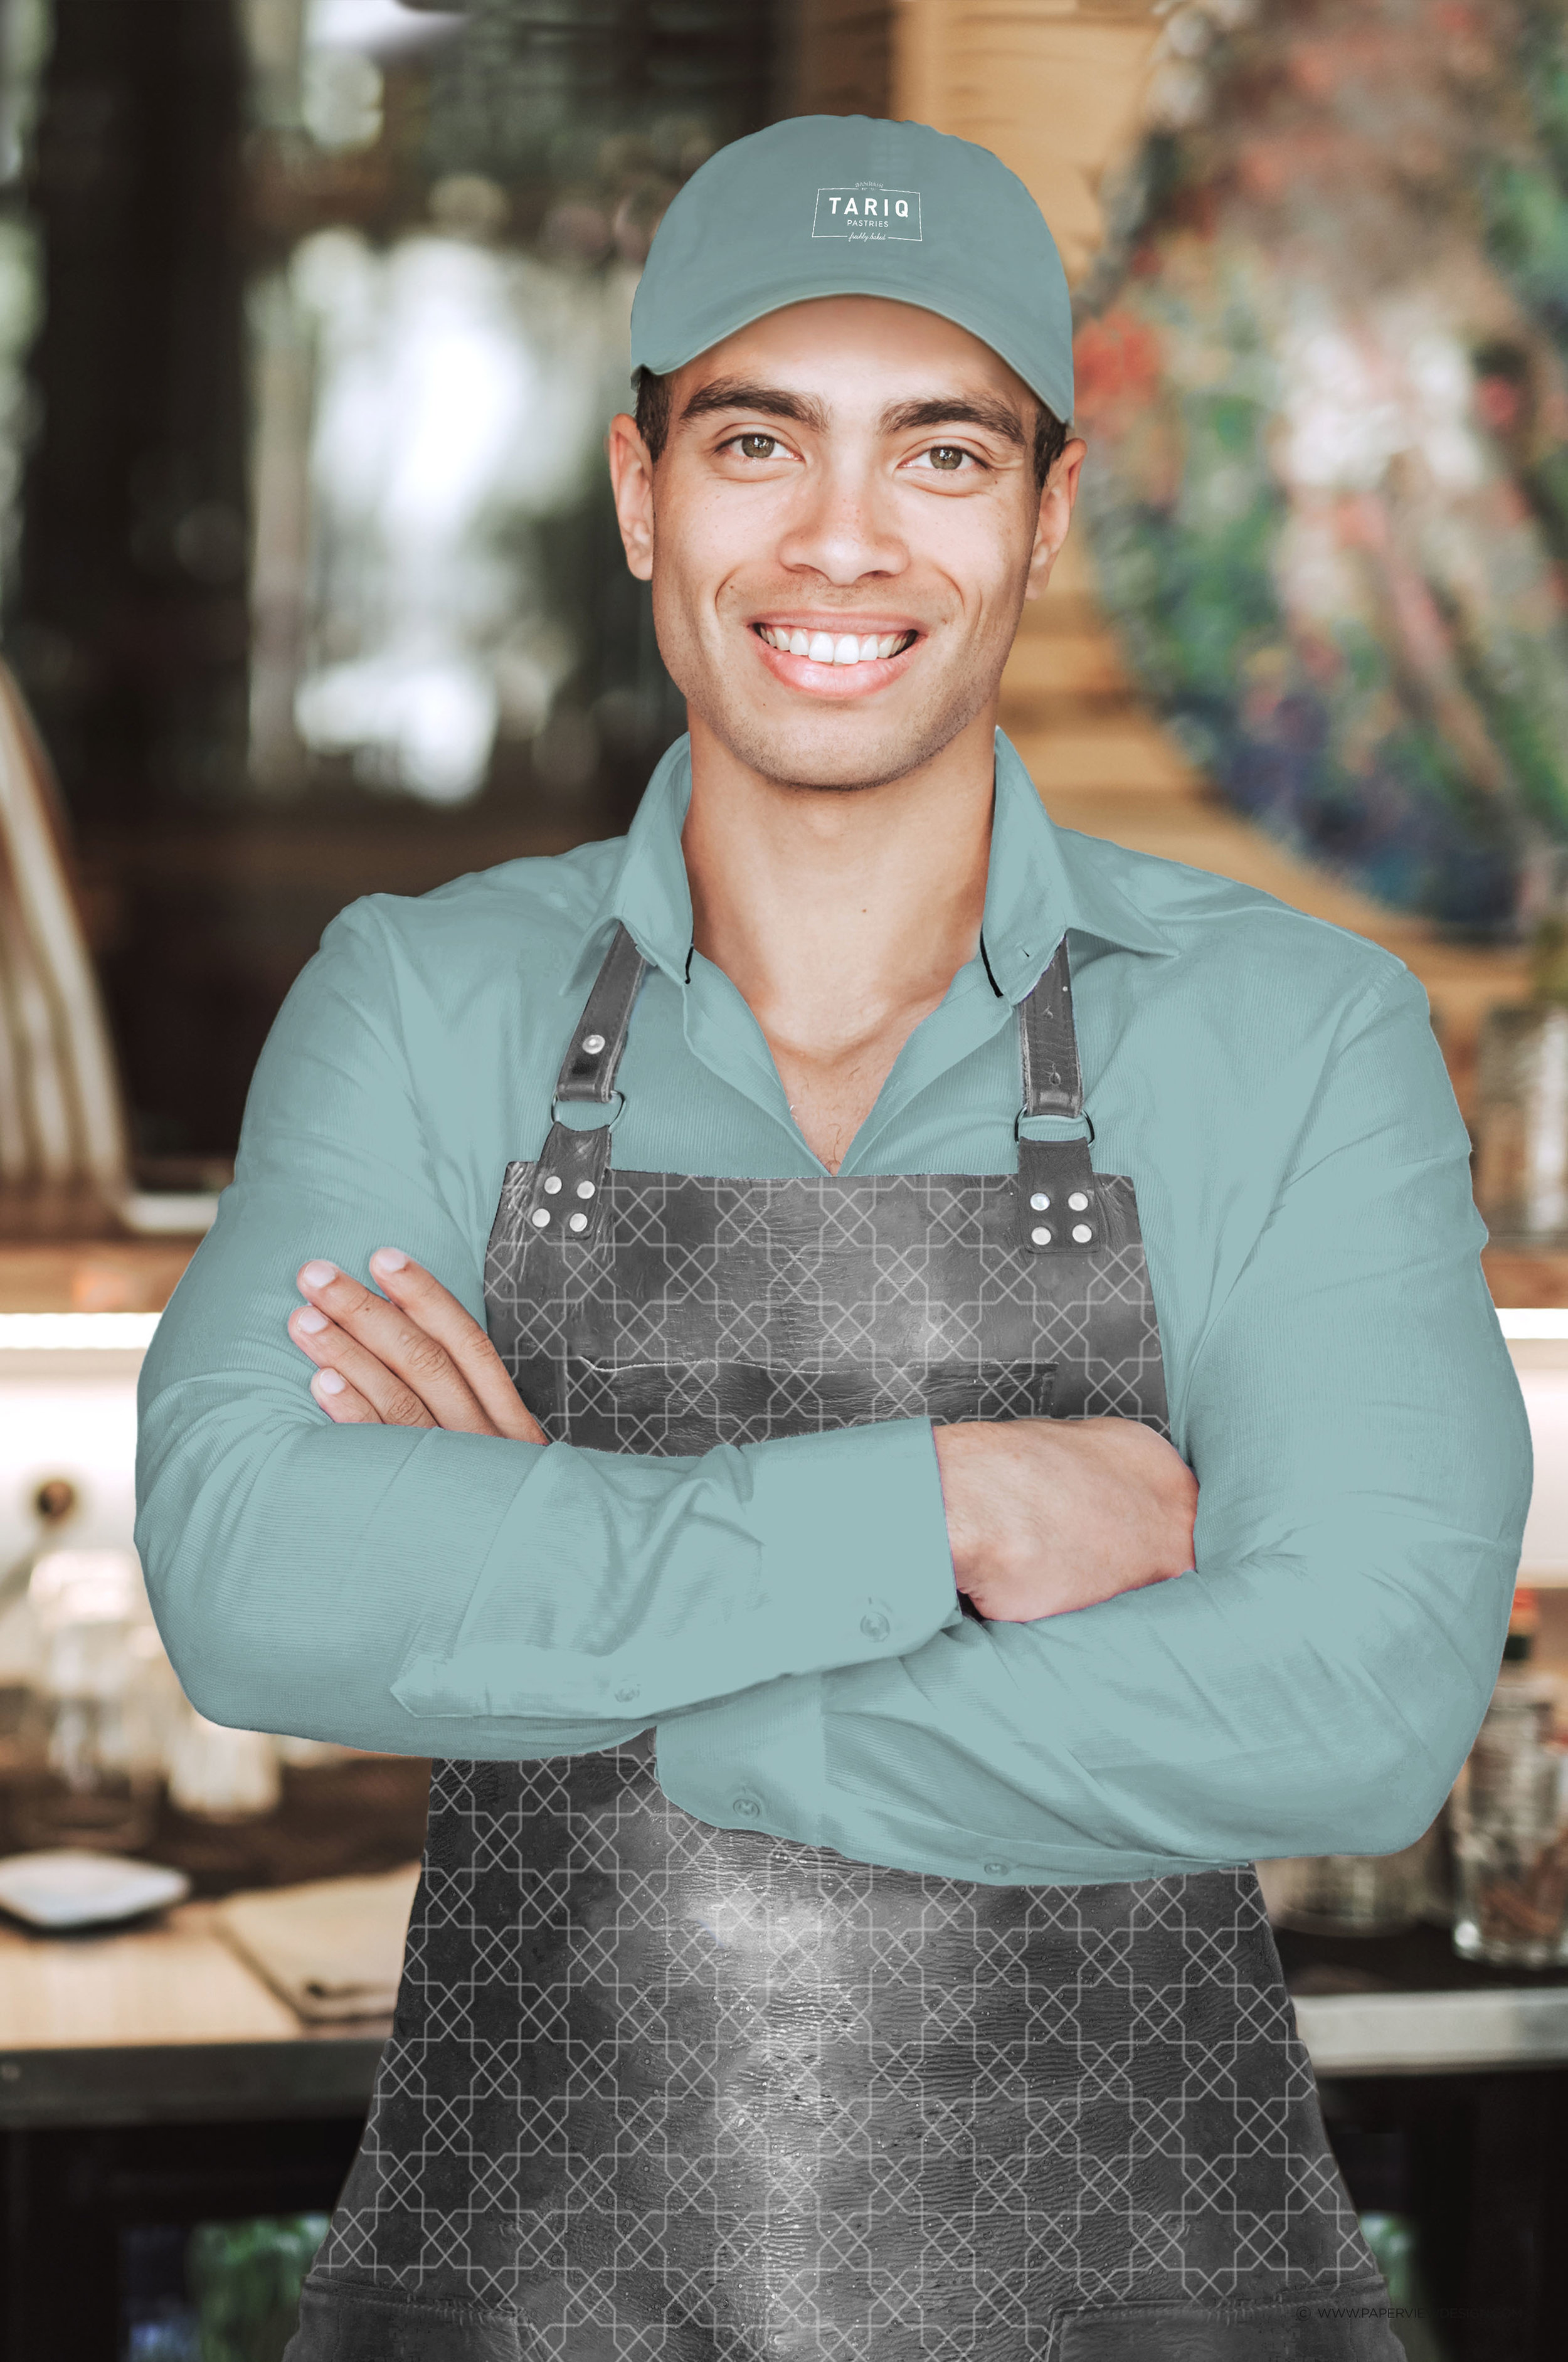 Tariq-Pastries-Uniform-Identity-Branding-Bahrain